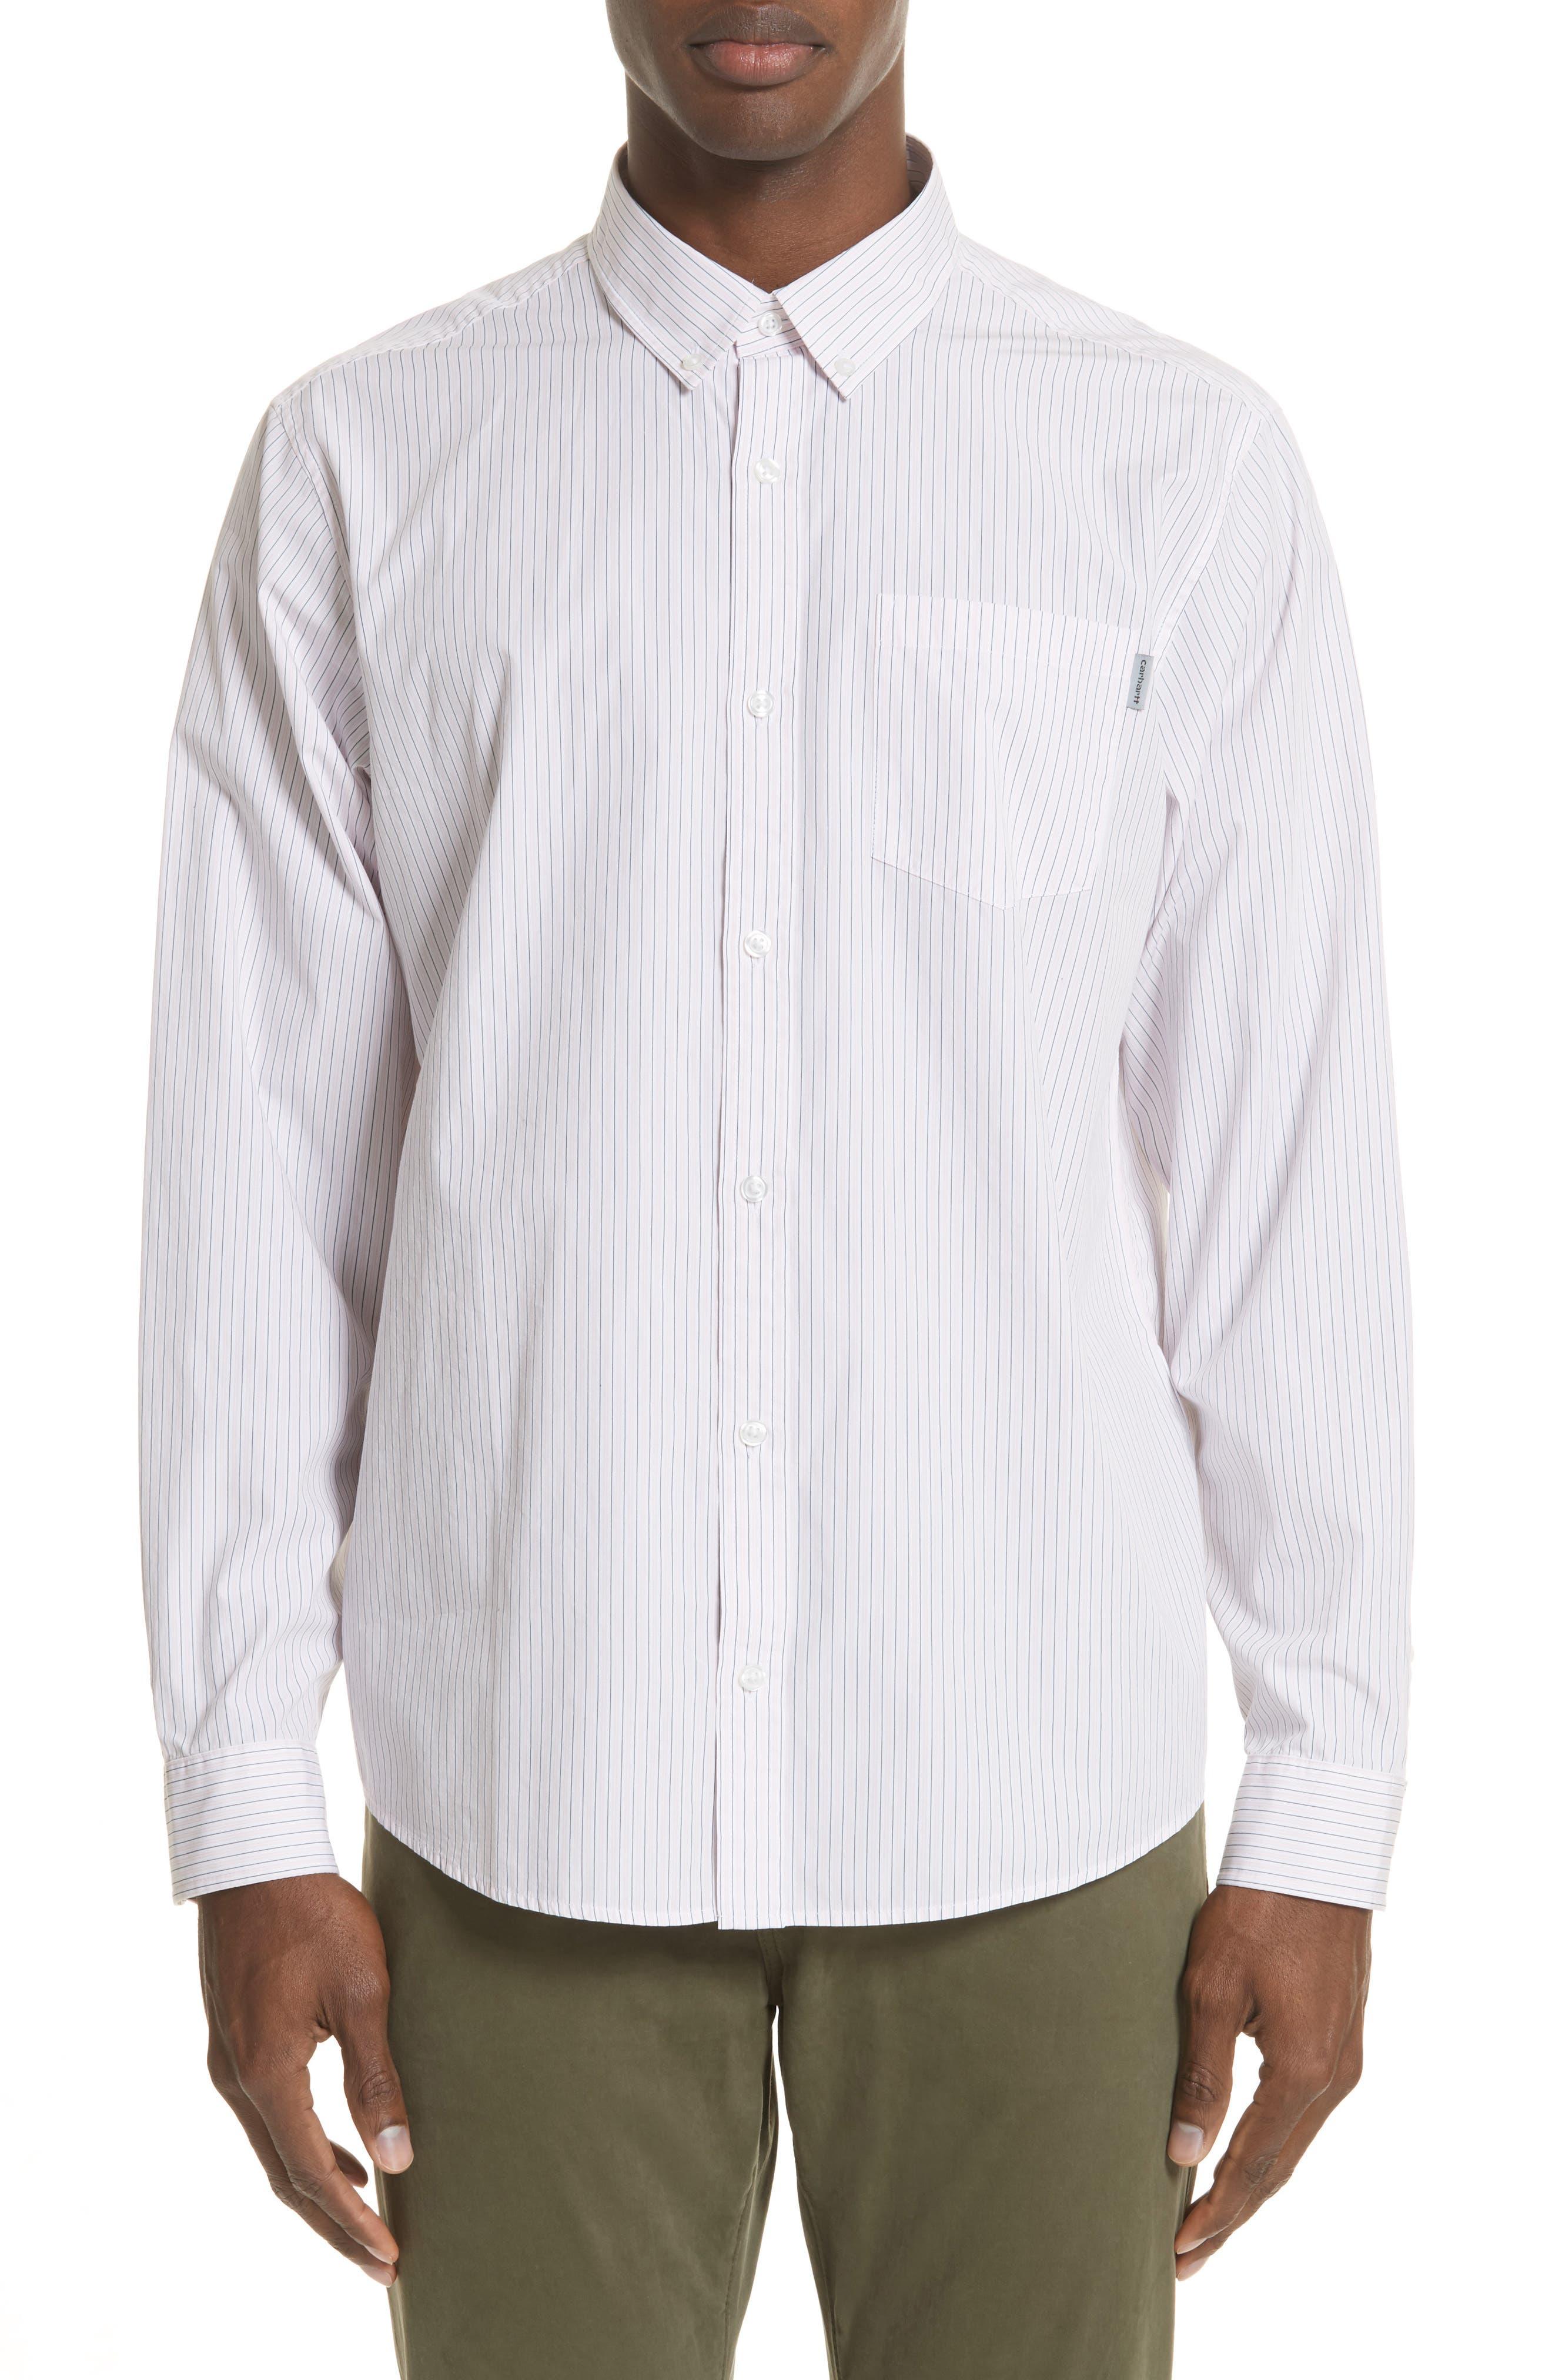 Crane Stripe Woven Shirt,                         Main,                         color, 971St-Sandy Rose